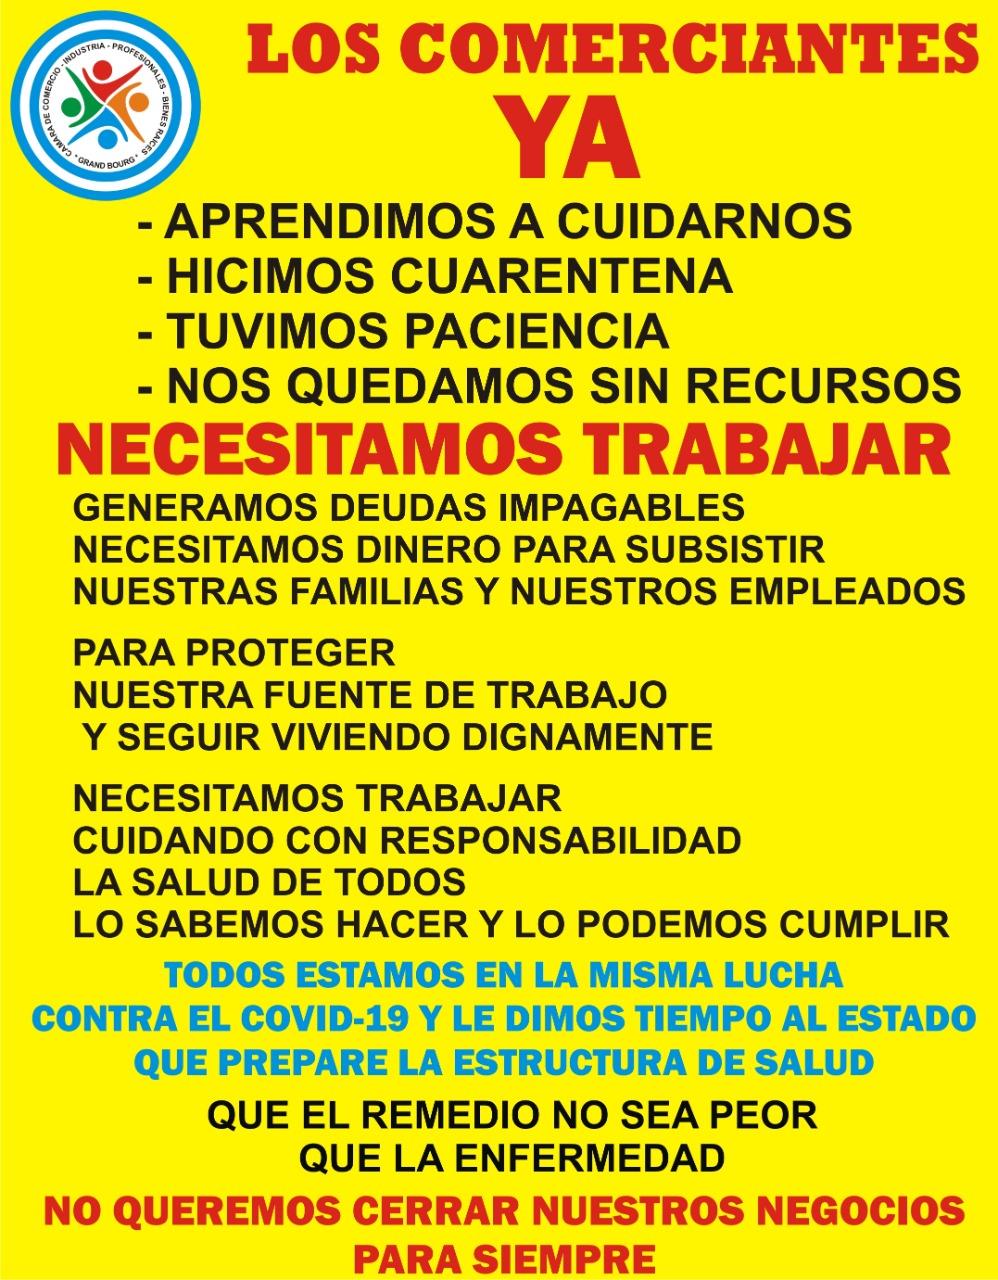 Malvinas Argentinas: Comunicado de la Cámara de Comercio de Grand Bourg. Aviso224